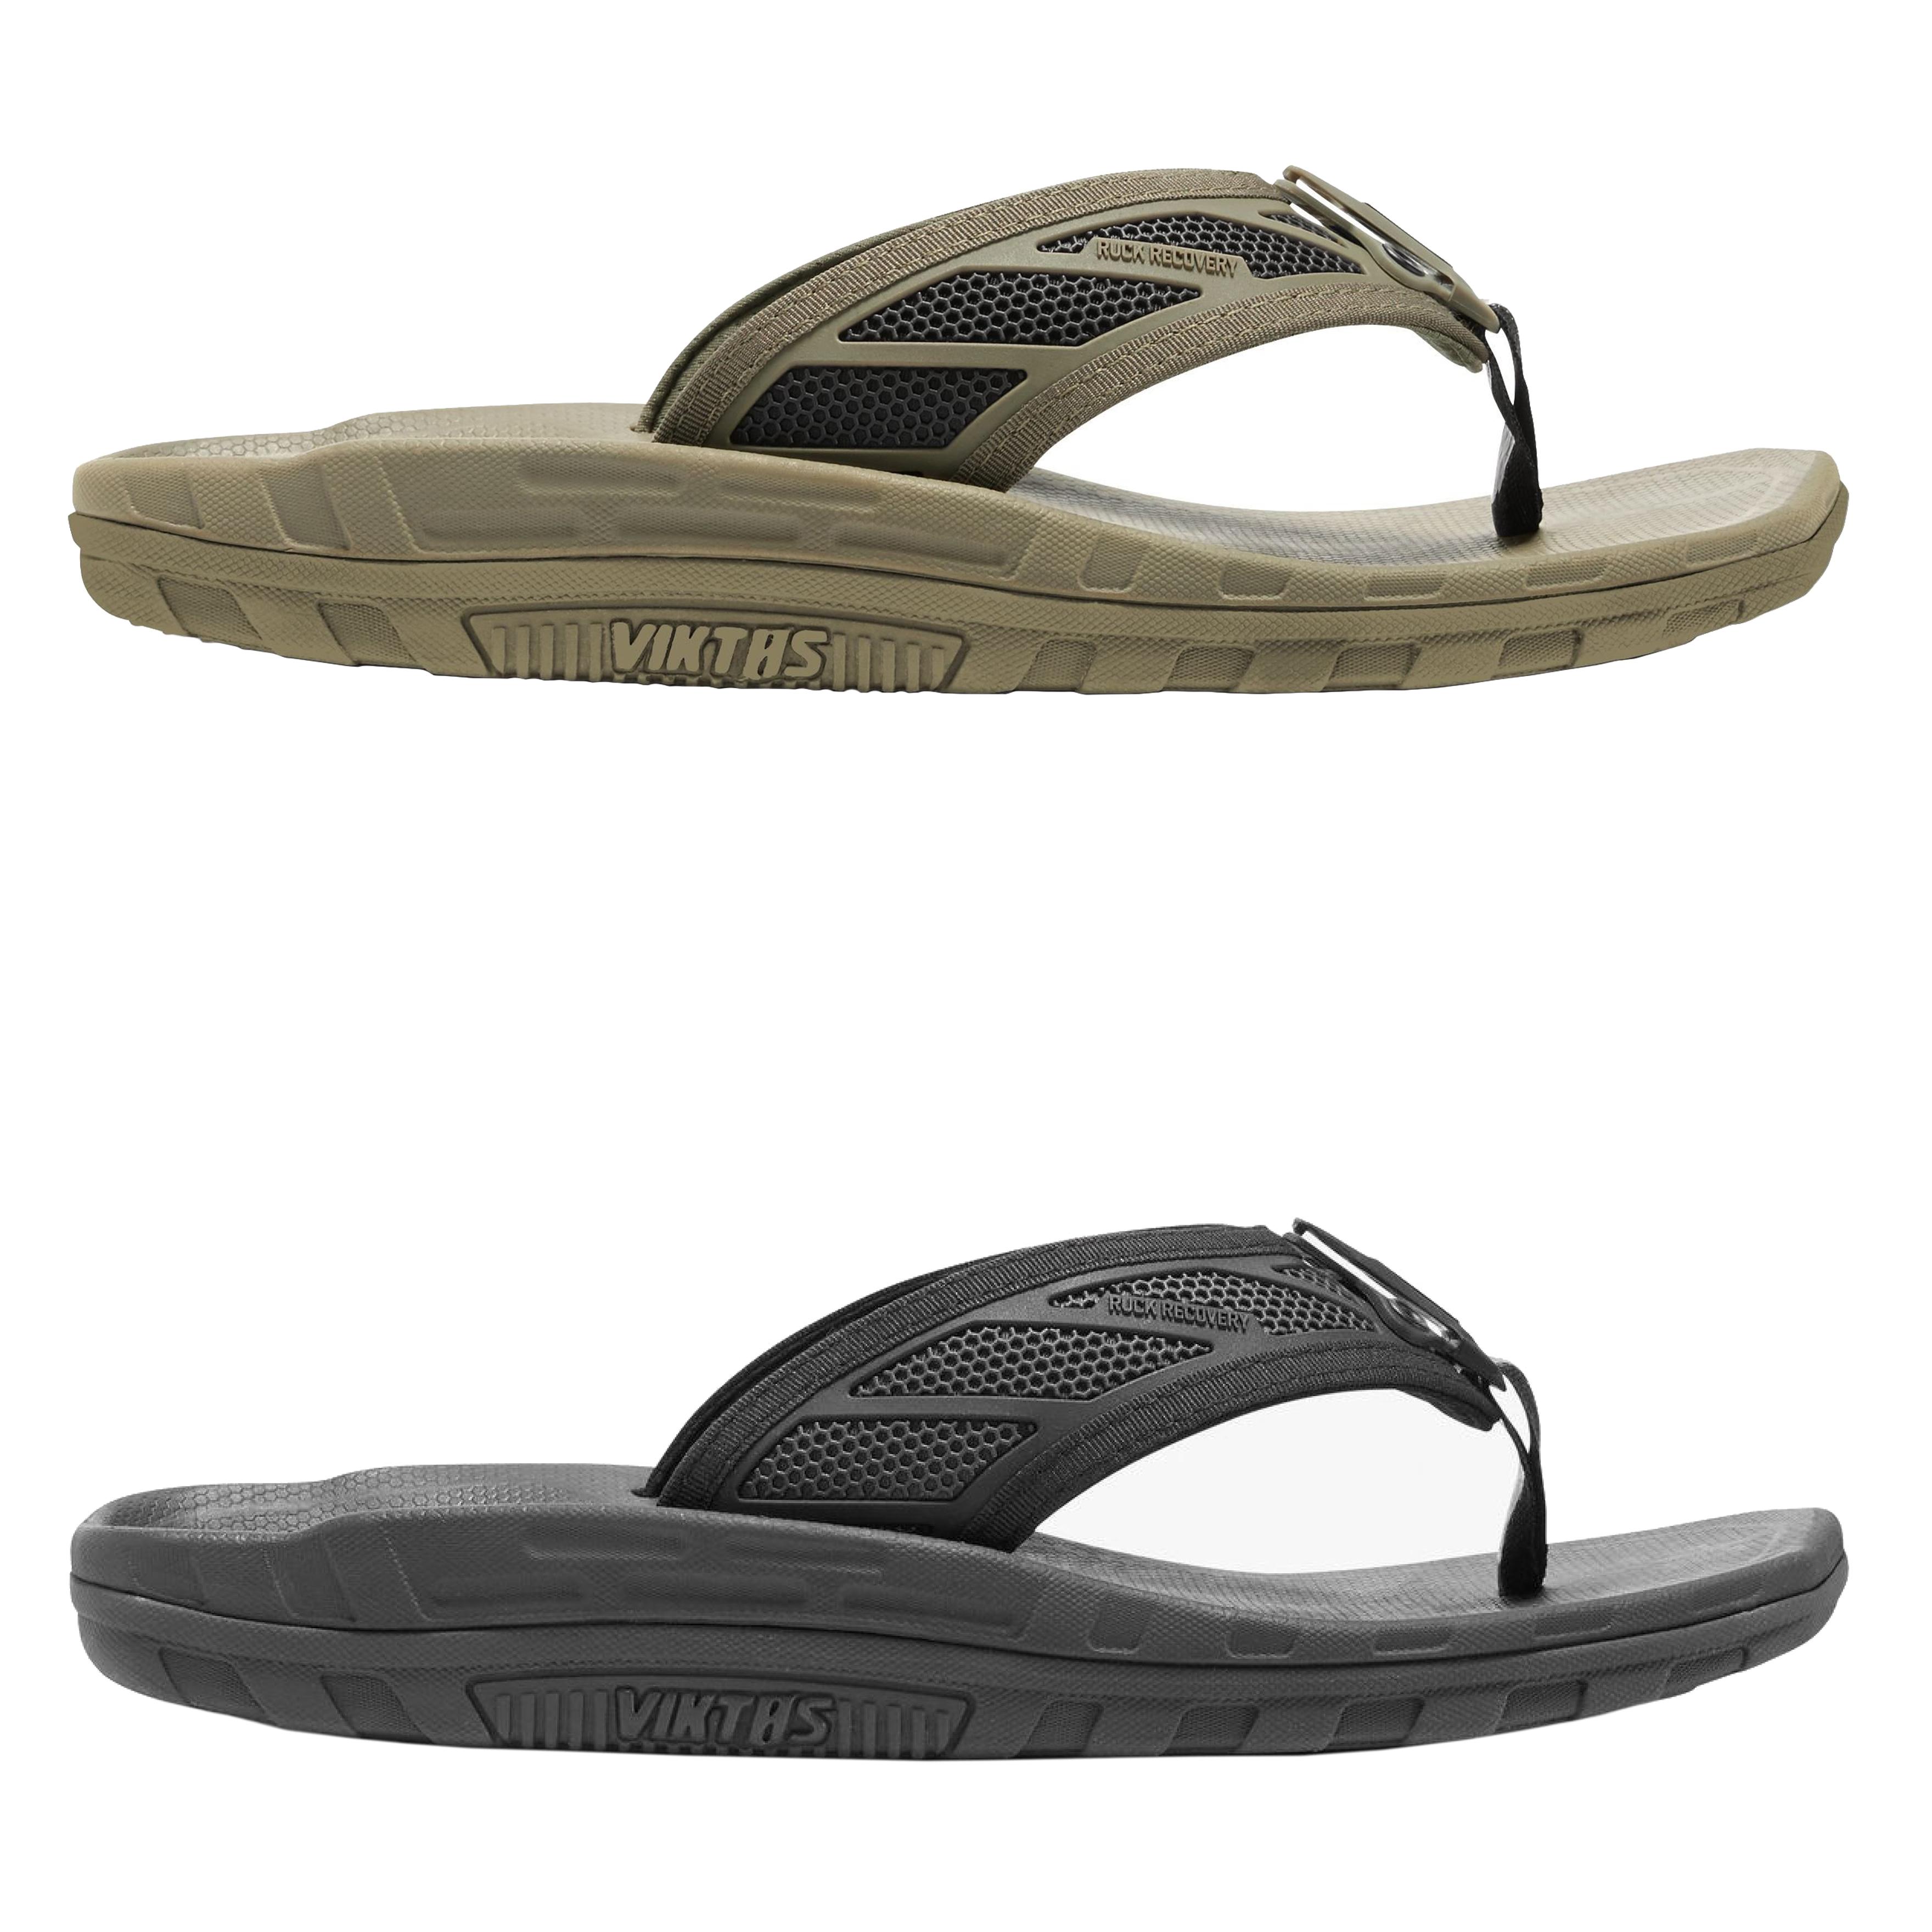 VIKTOS 1911 Sandal Size 13 NIGHTFJALL